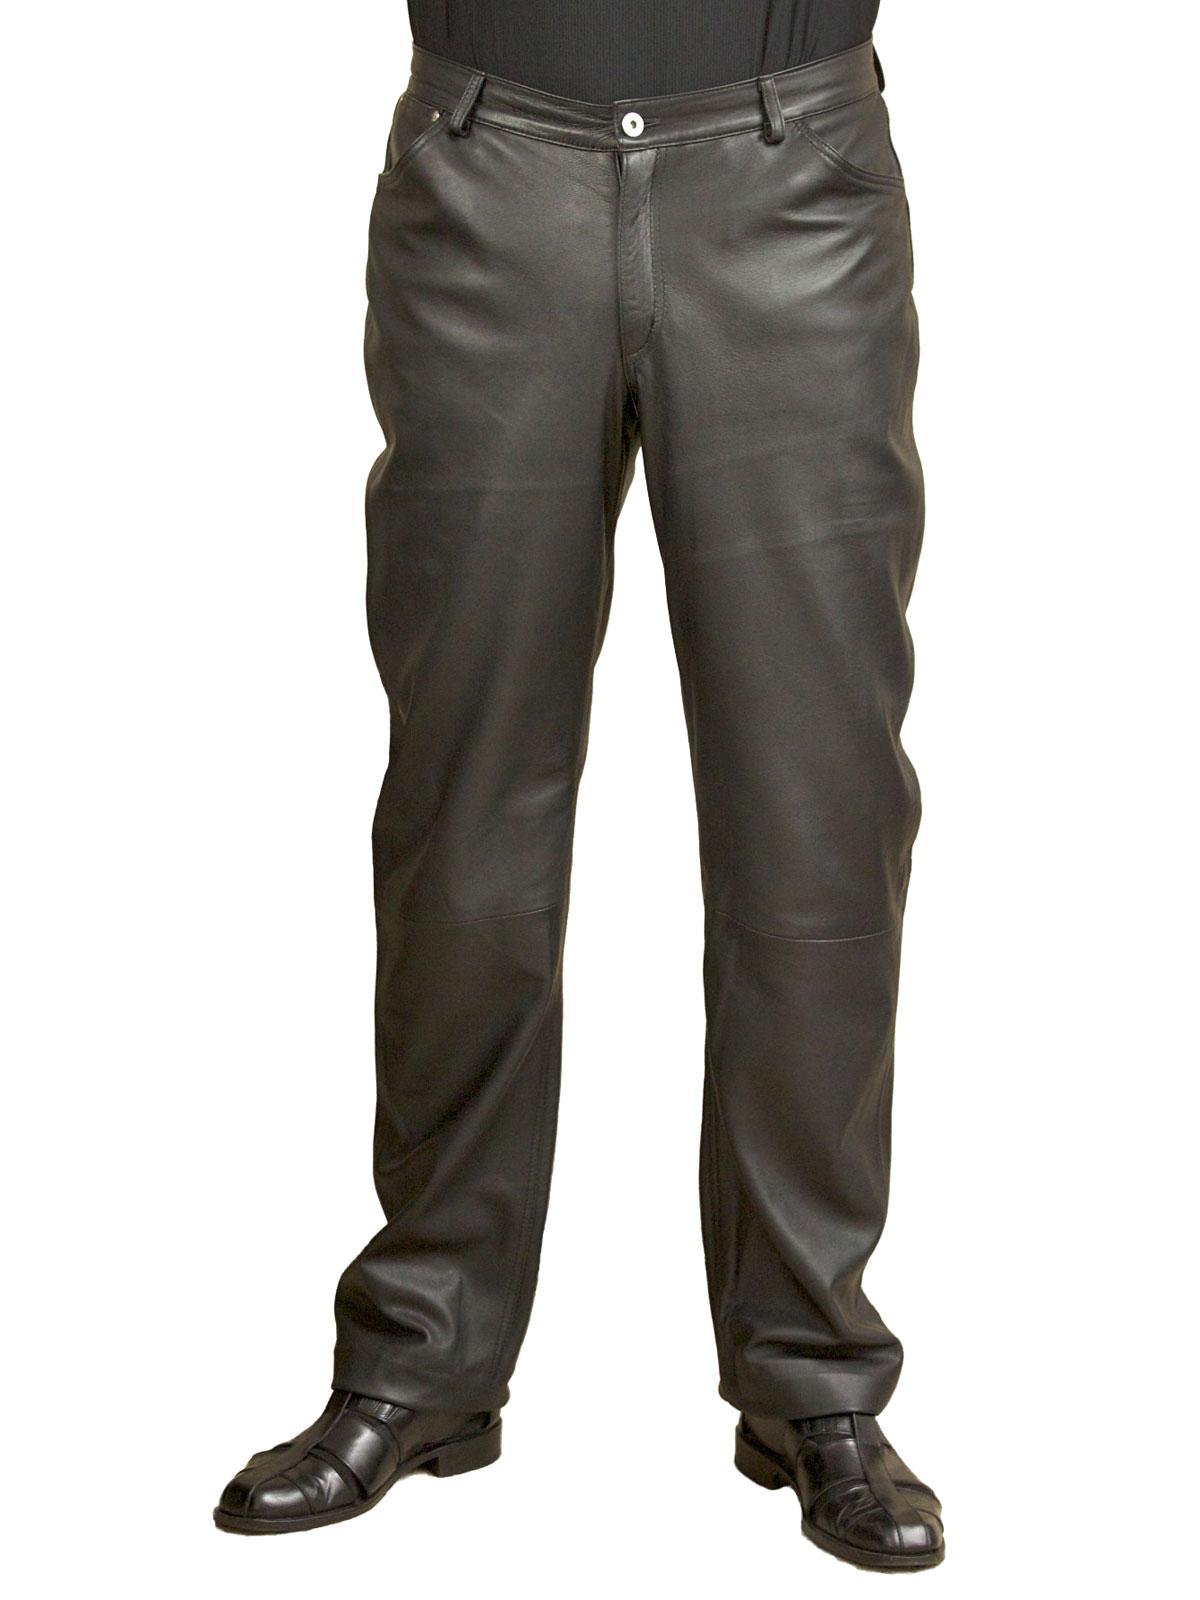 a6fe5b08cf78f Mens Black Soft Leather Trousers Jeans - Tout Ensemble